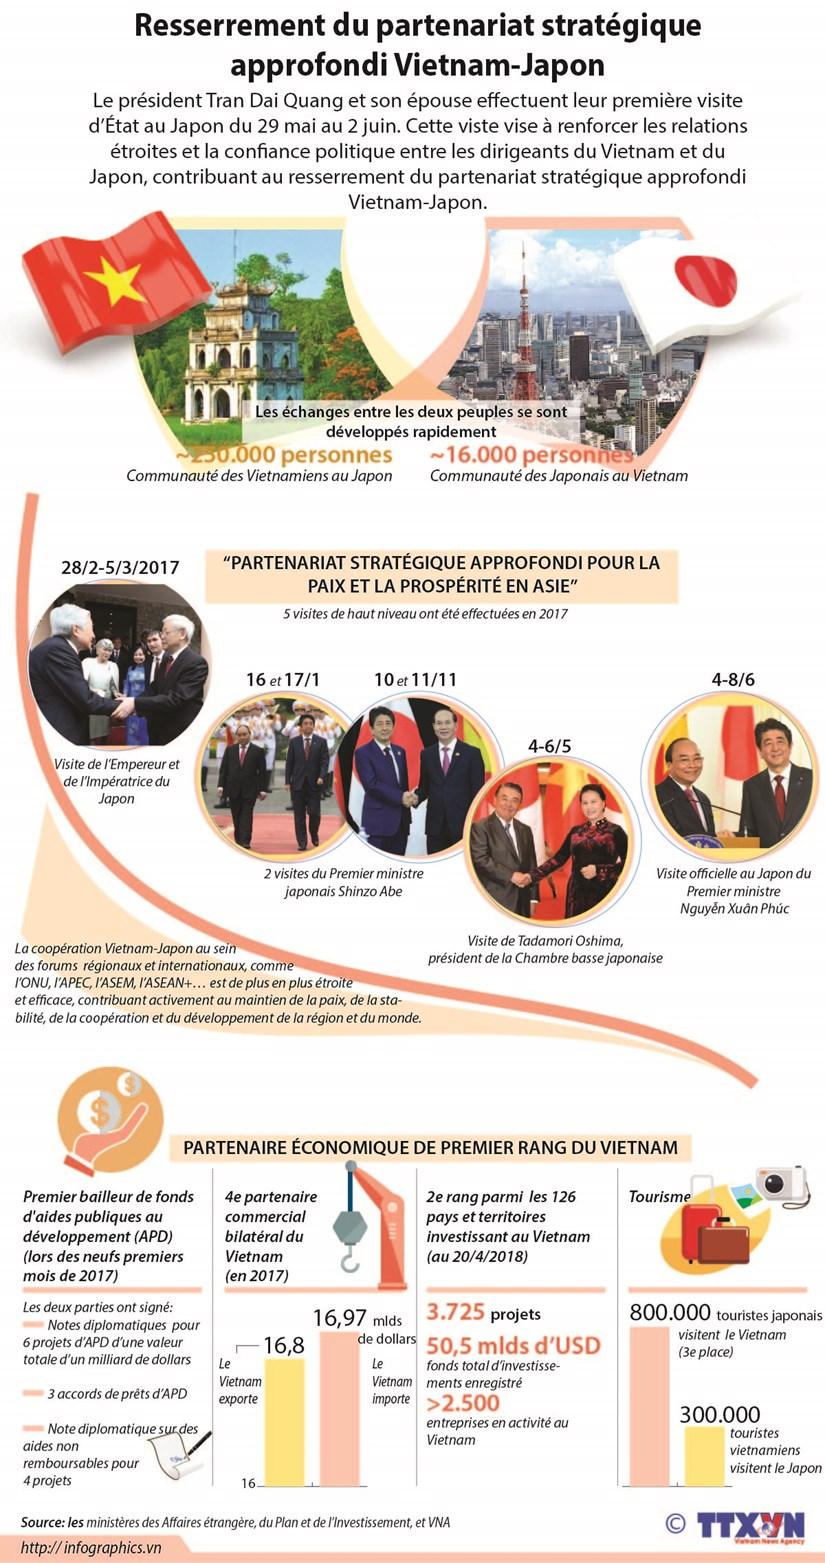 Resserrement du partenariat strategique approfondi Vietnam-Japon hinh anh 1